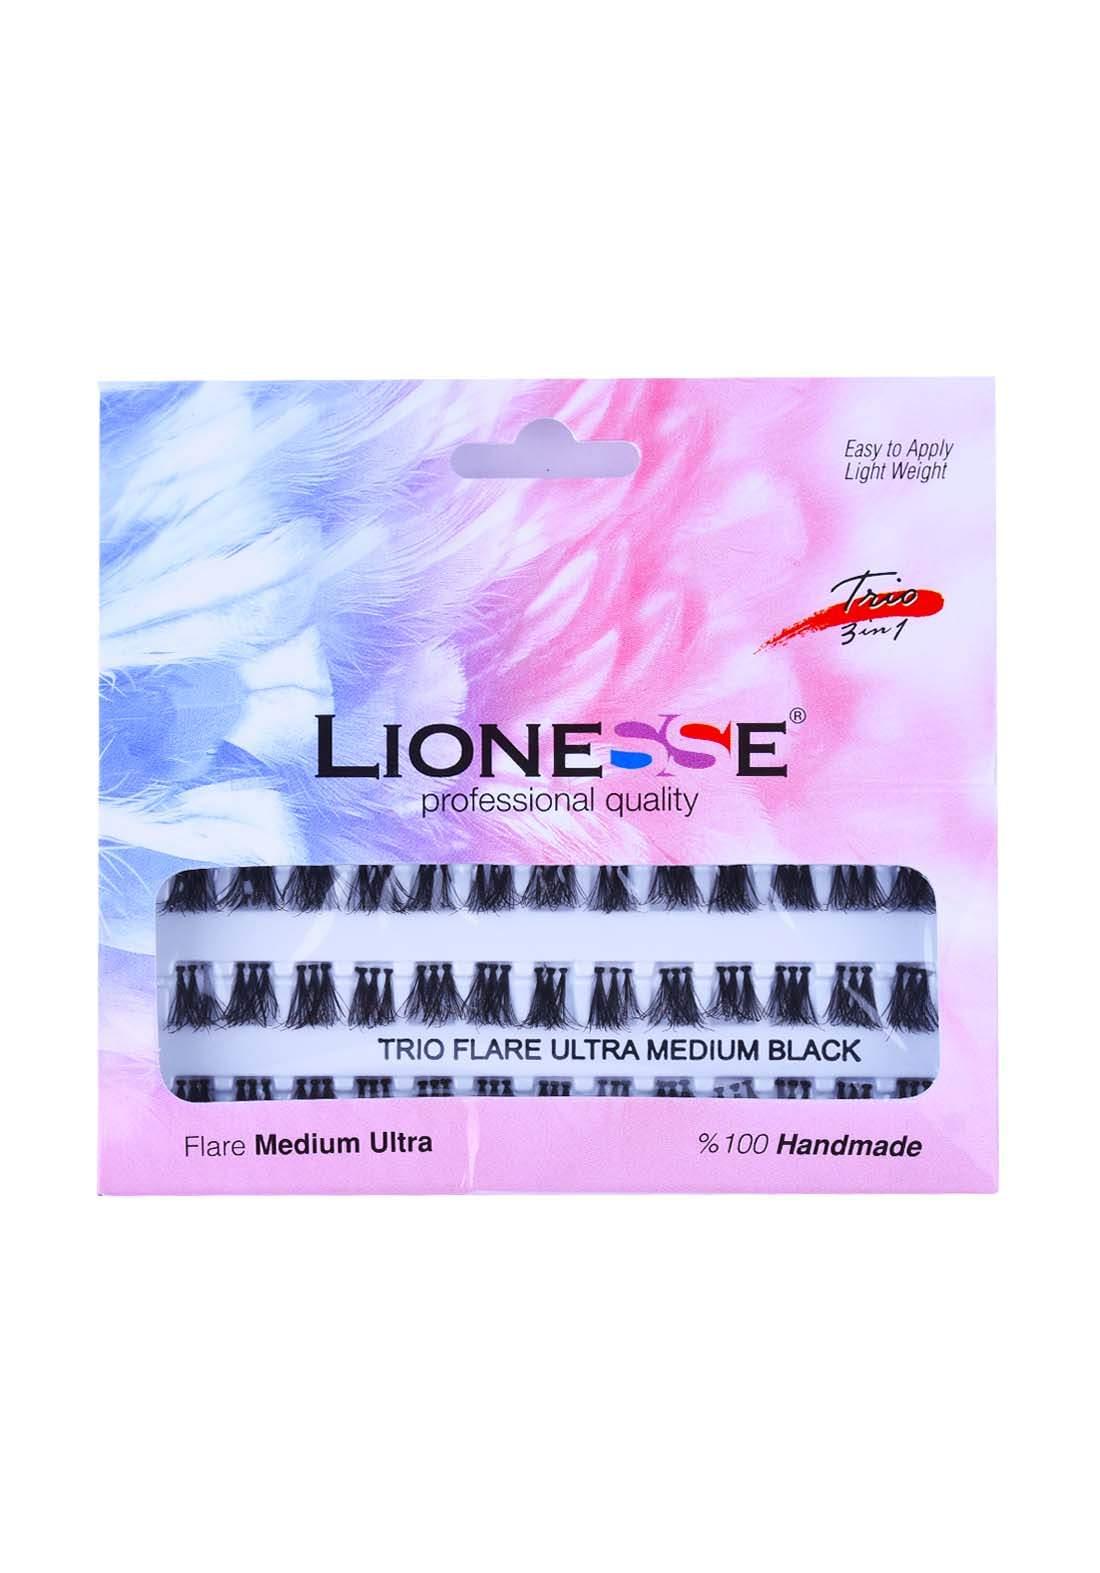 Lionesse Fl-751 Trio 3D Single False Eyelashes رموش مفردة